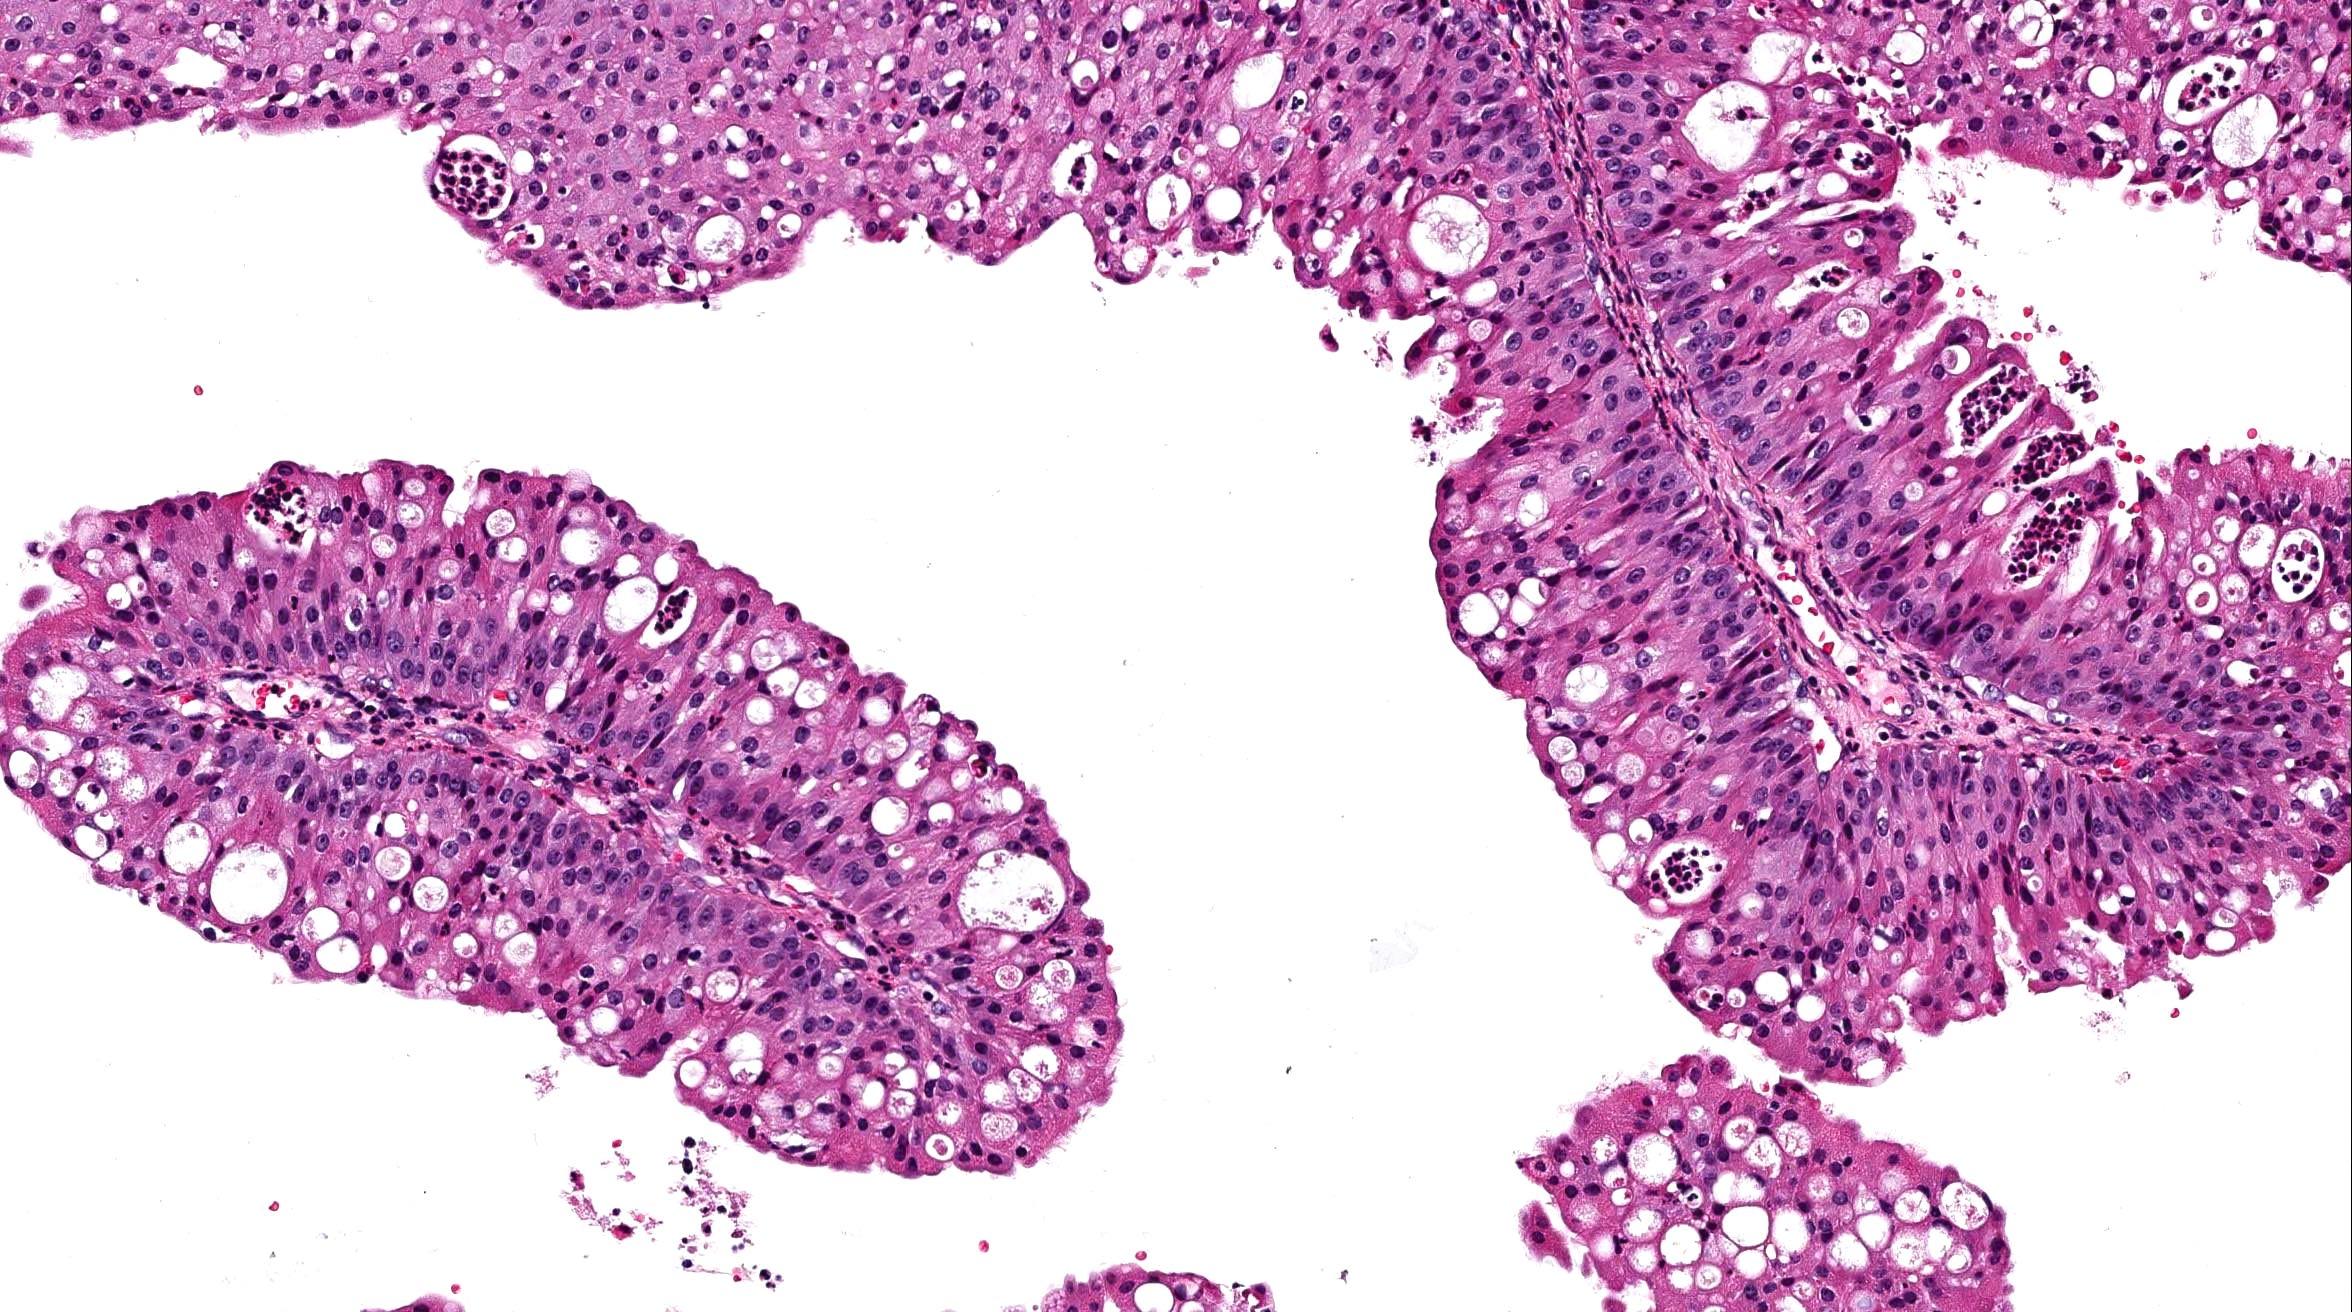 papiloma urotelial pathology outlines